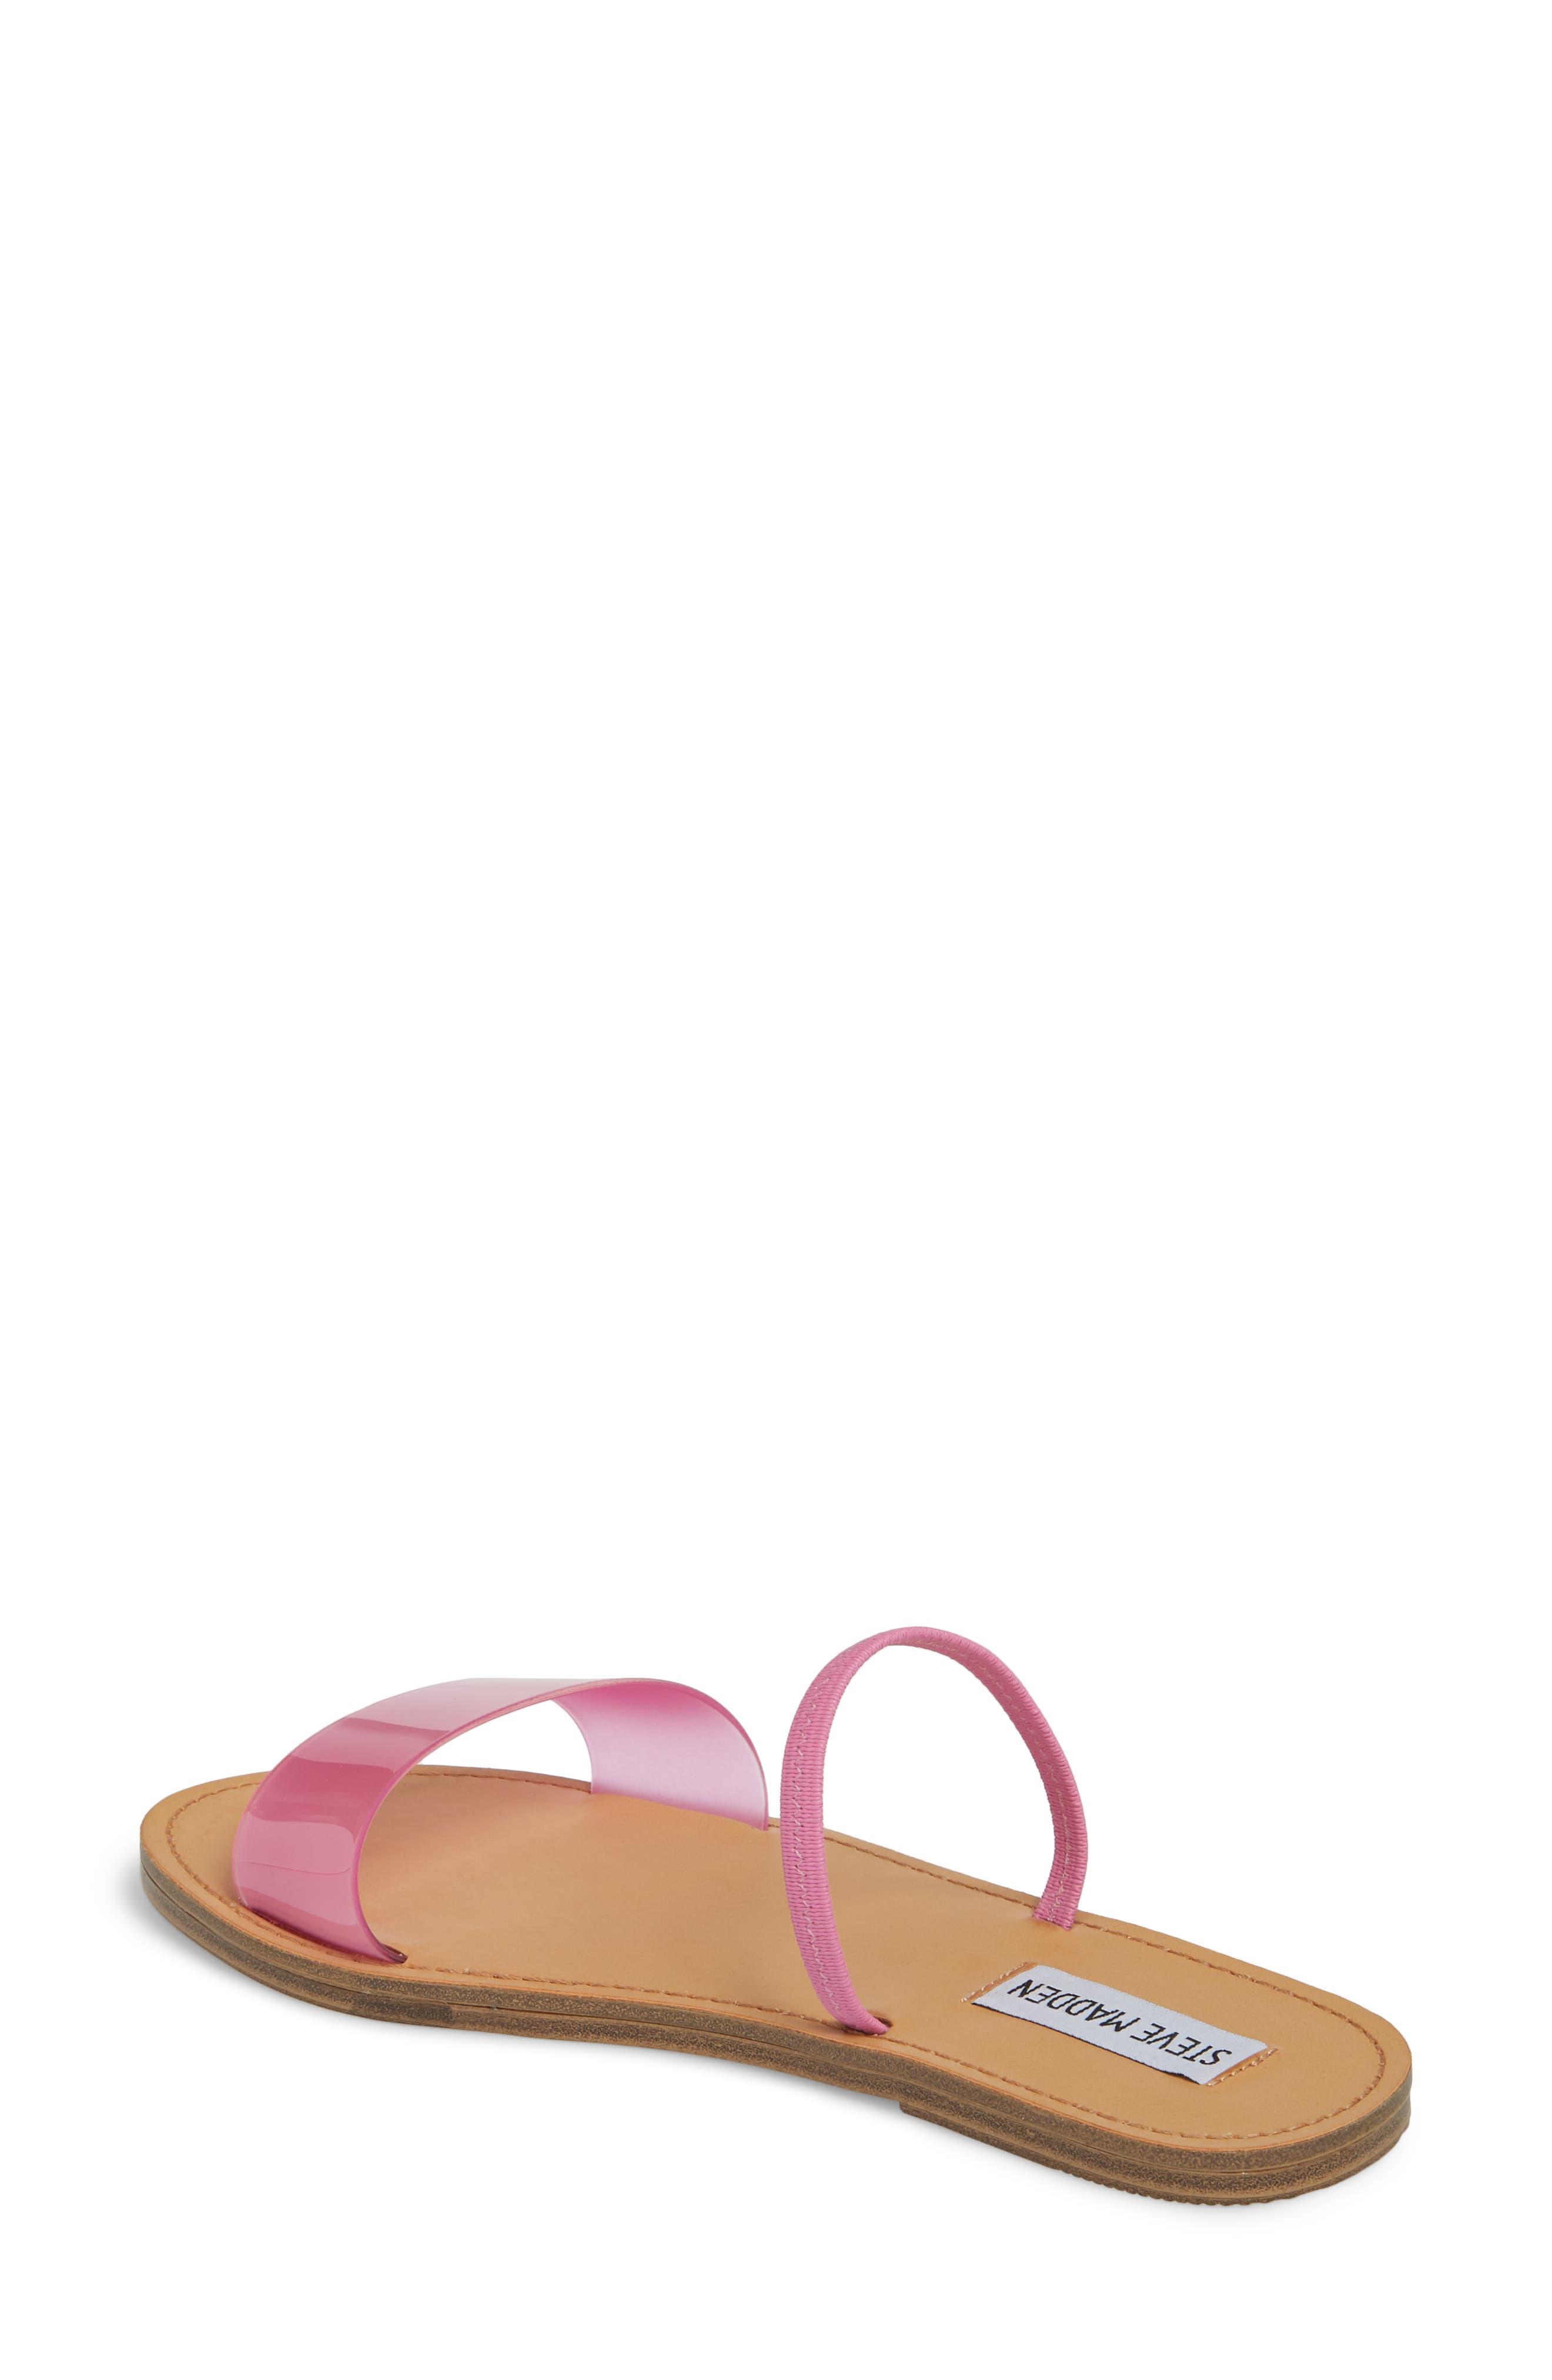 Dasha Strappy Slide Sandal,                             Alternate thumbnail 6, color,